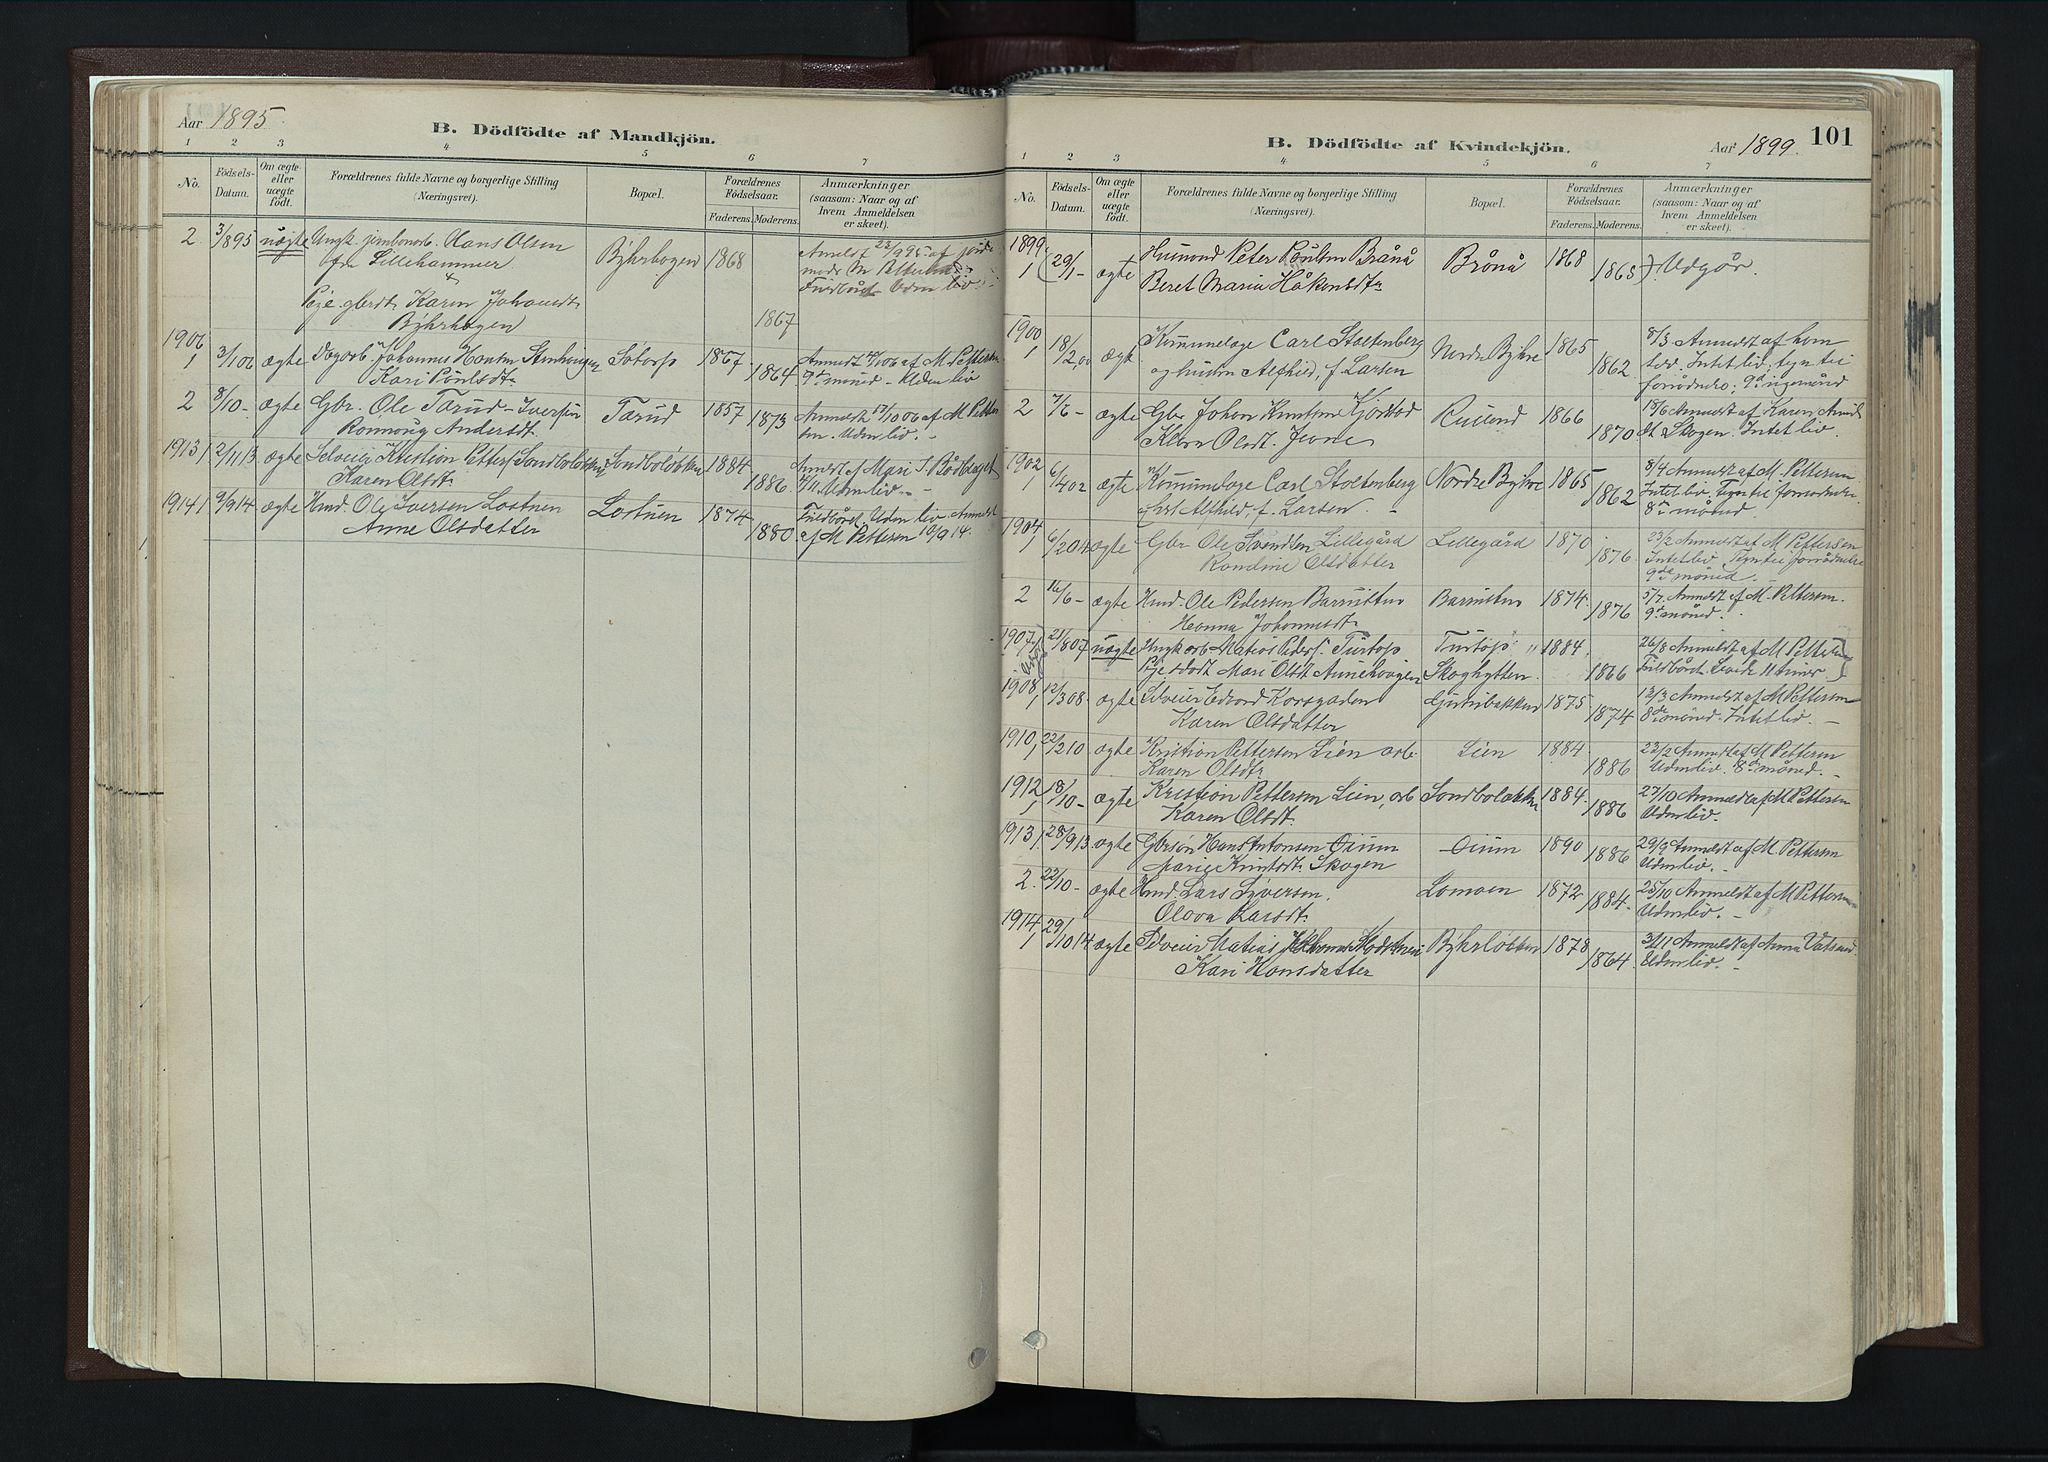 SAH, Nord-Fron prestekontor, Ministerialbok nr. 4, 1884-1914, s. 101